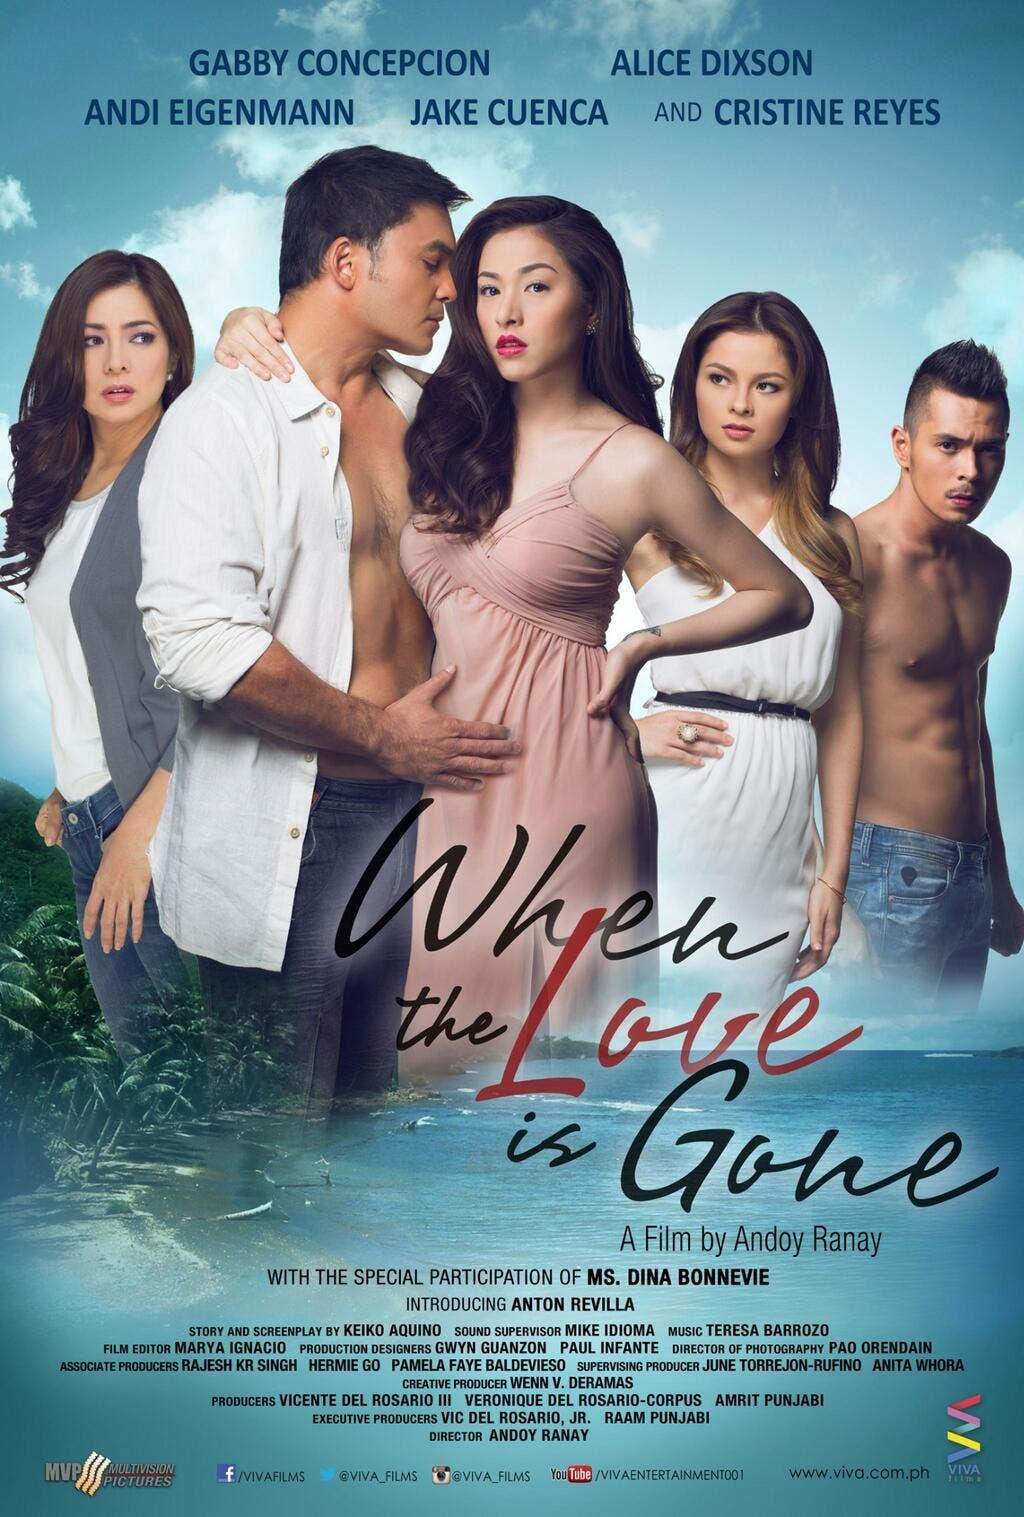 alice in dreamland movie 2016 tagalog movie